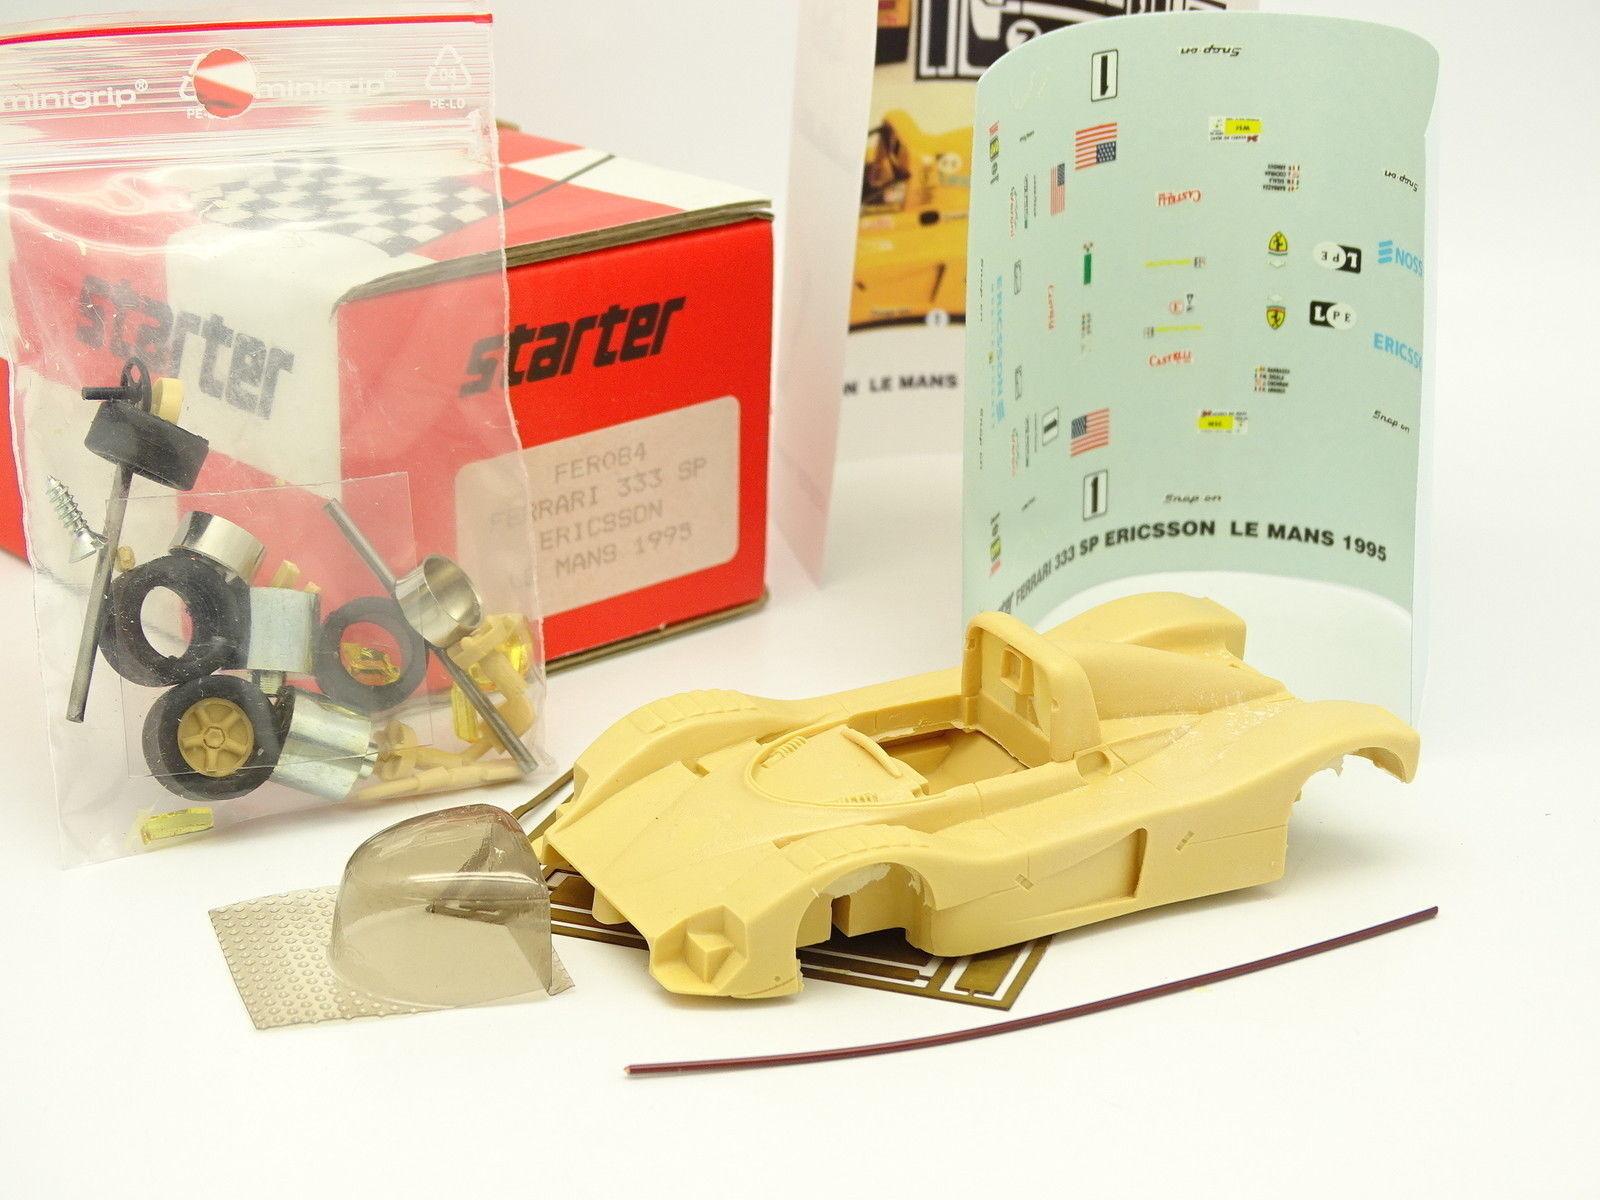 Starter kit to fit 1 43 - ferrari 333 sp le mans 1994 ericsson